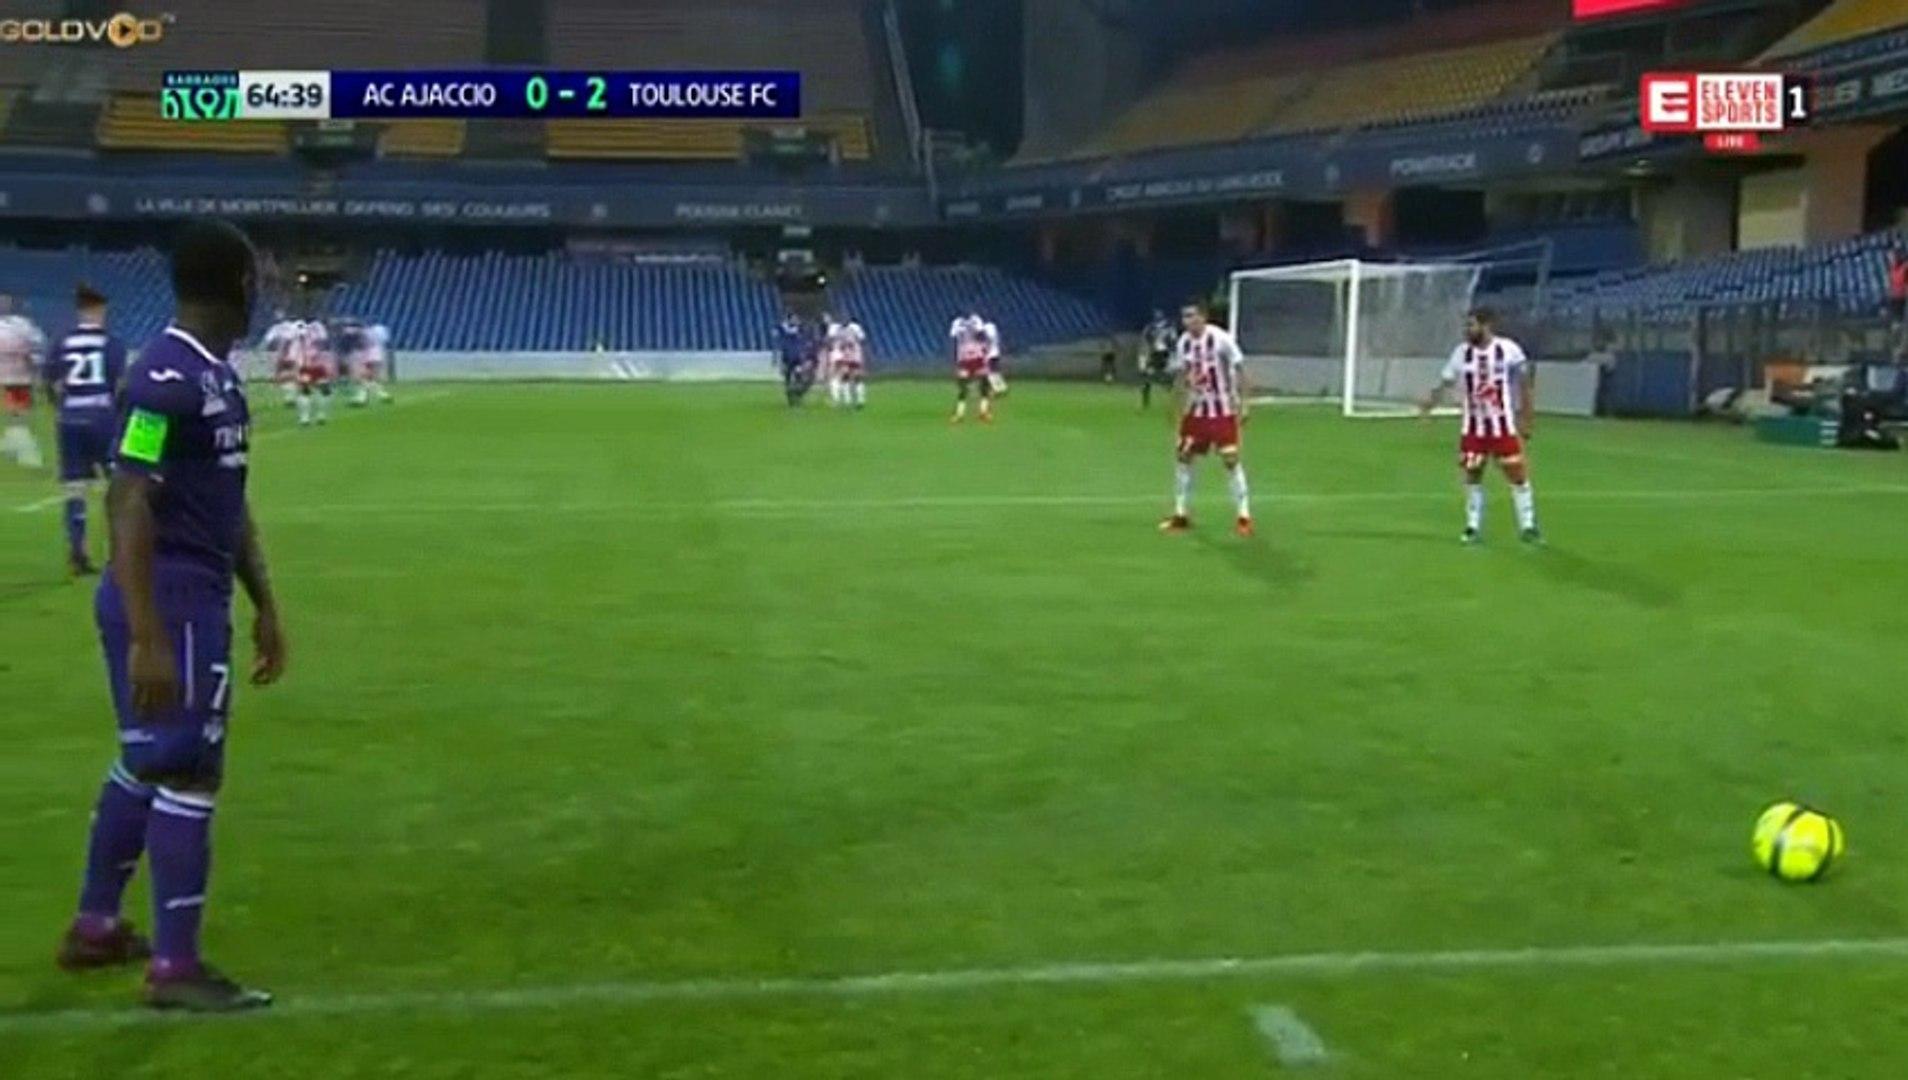 Yaya Sanogo Goal HD - AC Ajaccio 0-3 Toulouse 23.05.2018